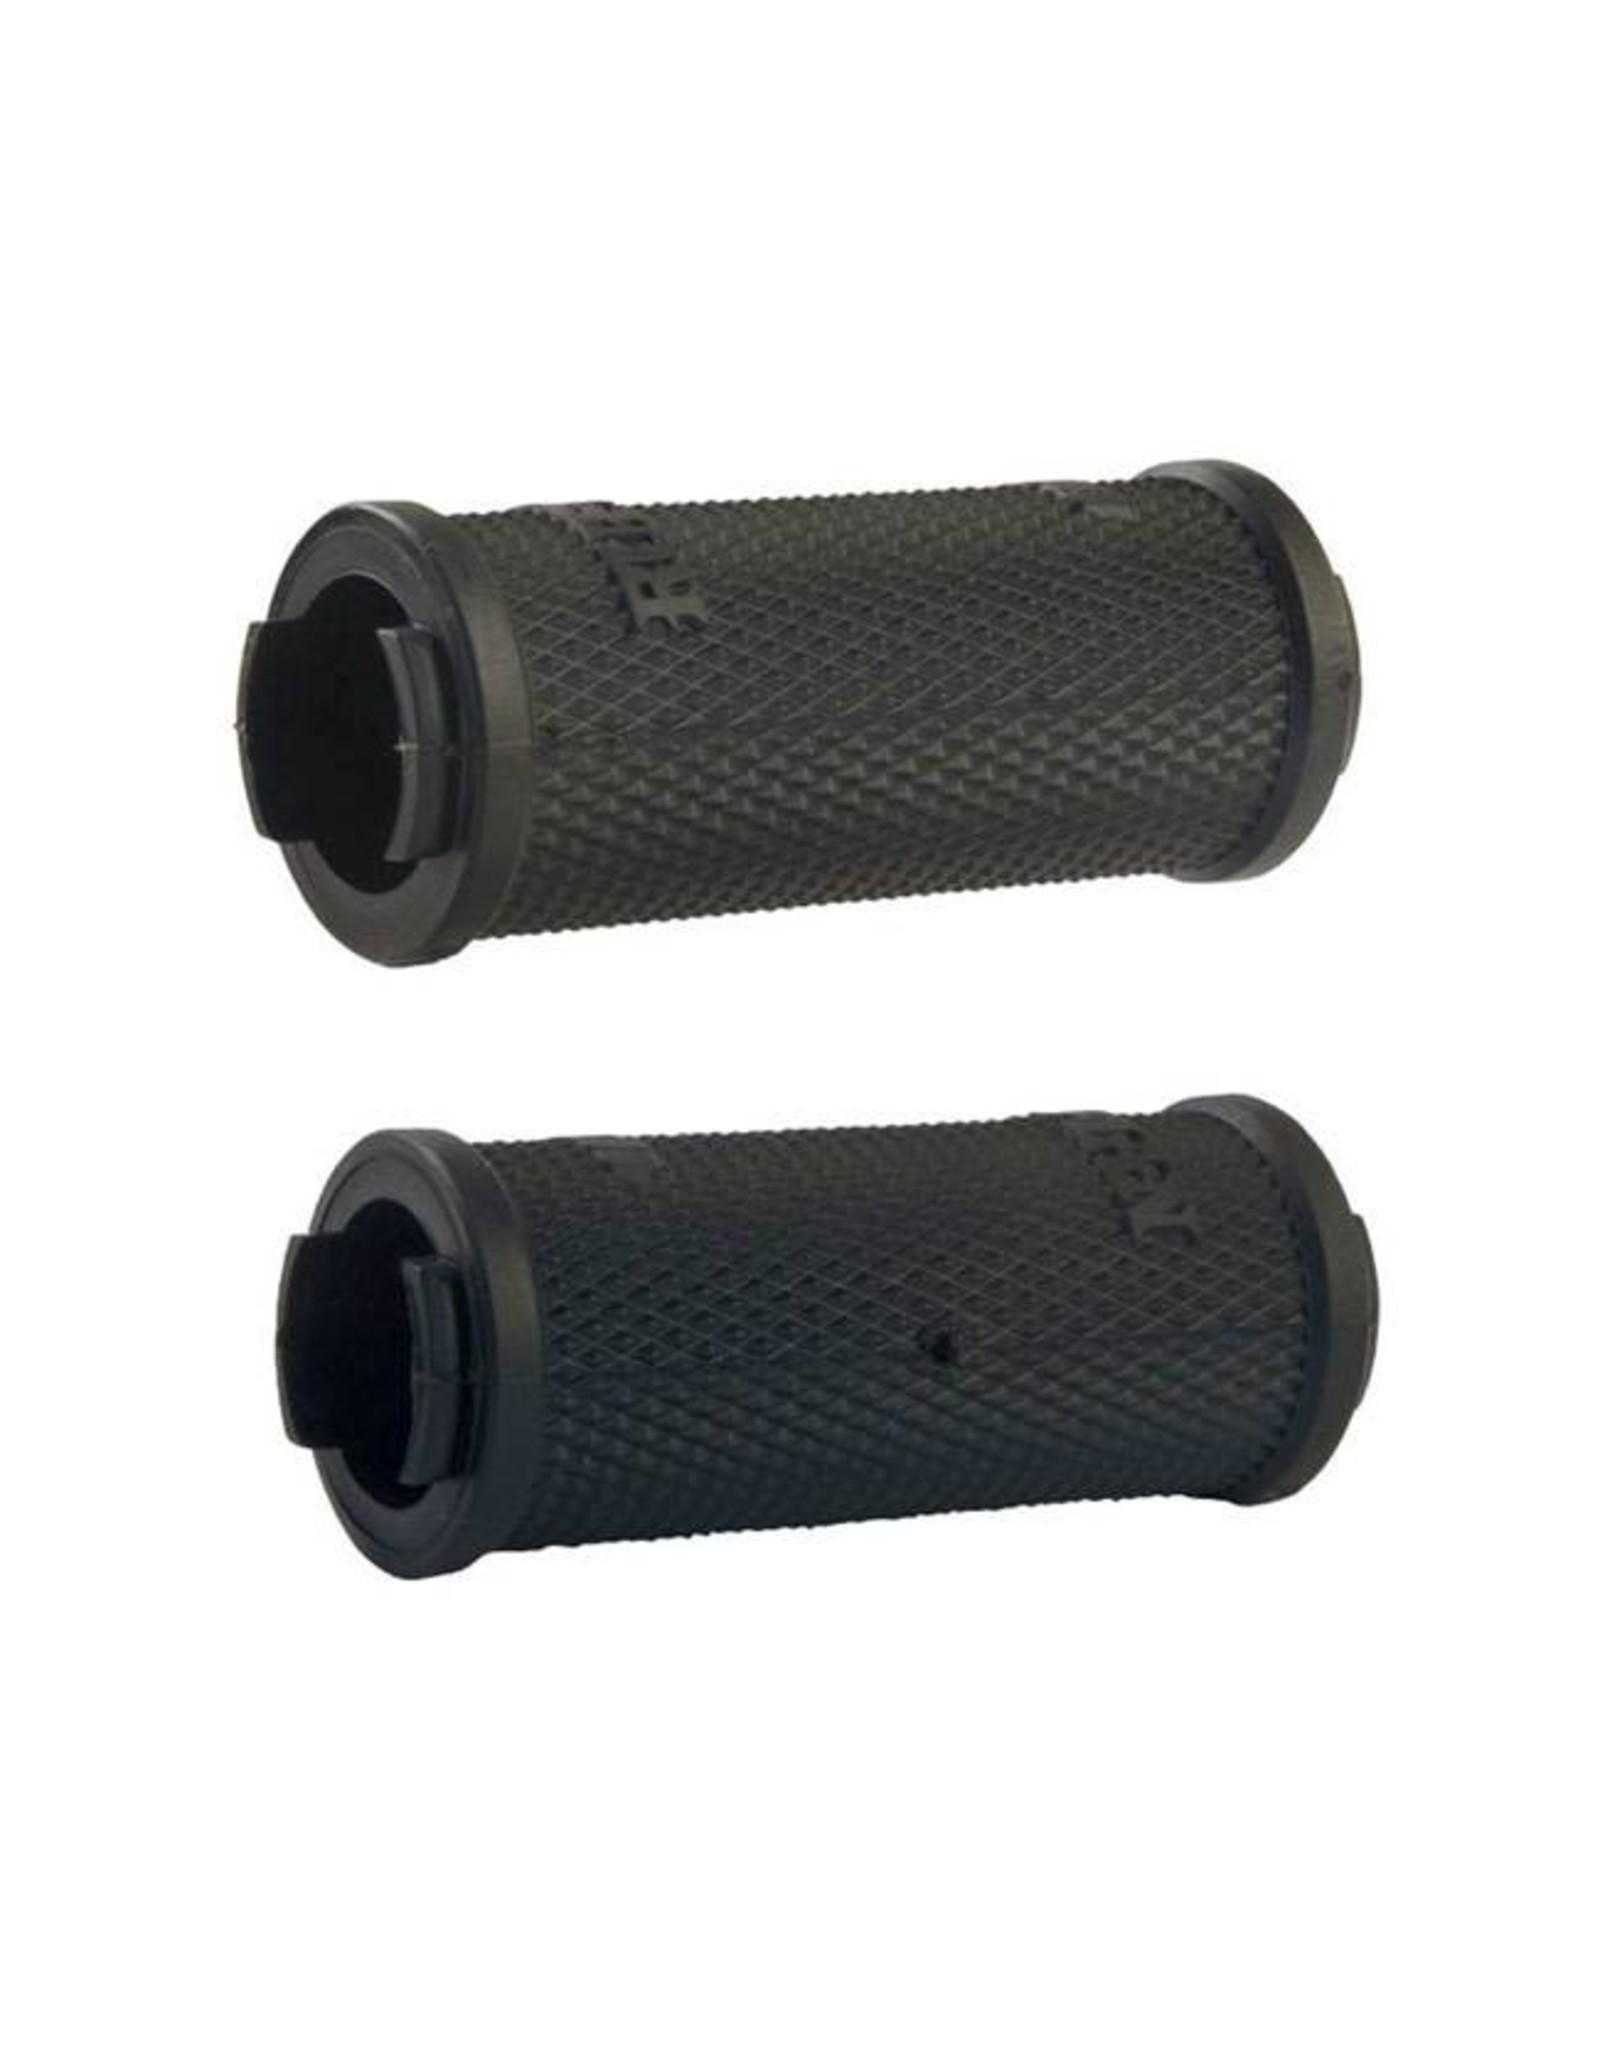 ODI ODI Ruffian Grip-Shift Lock-On Grips: Black